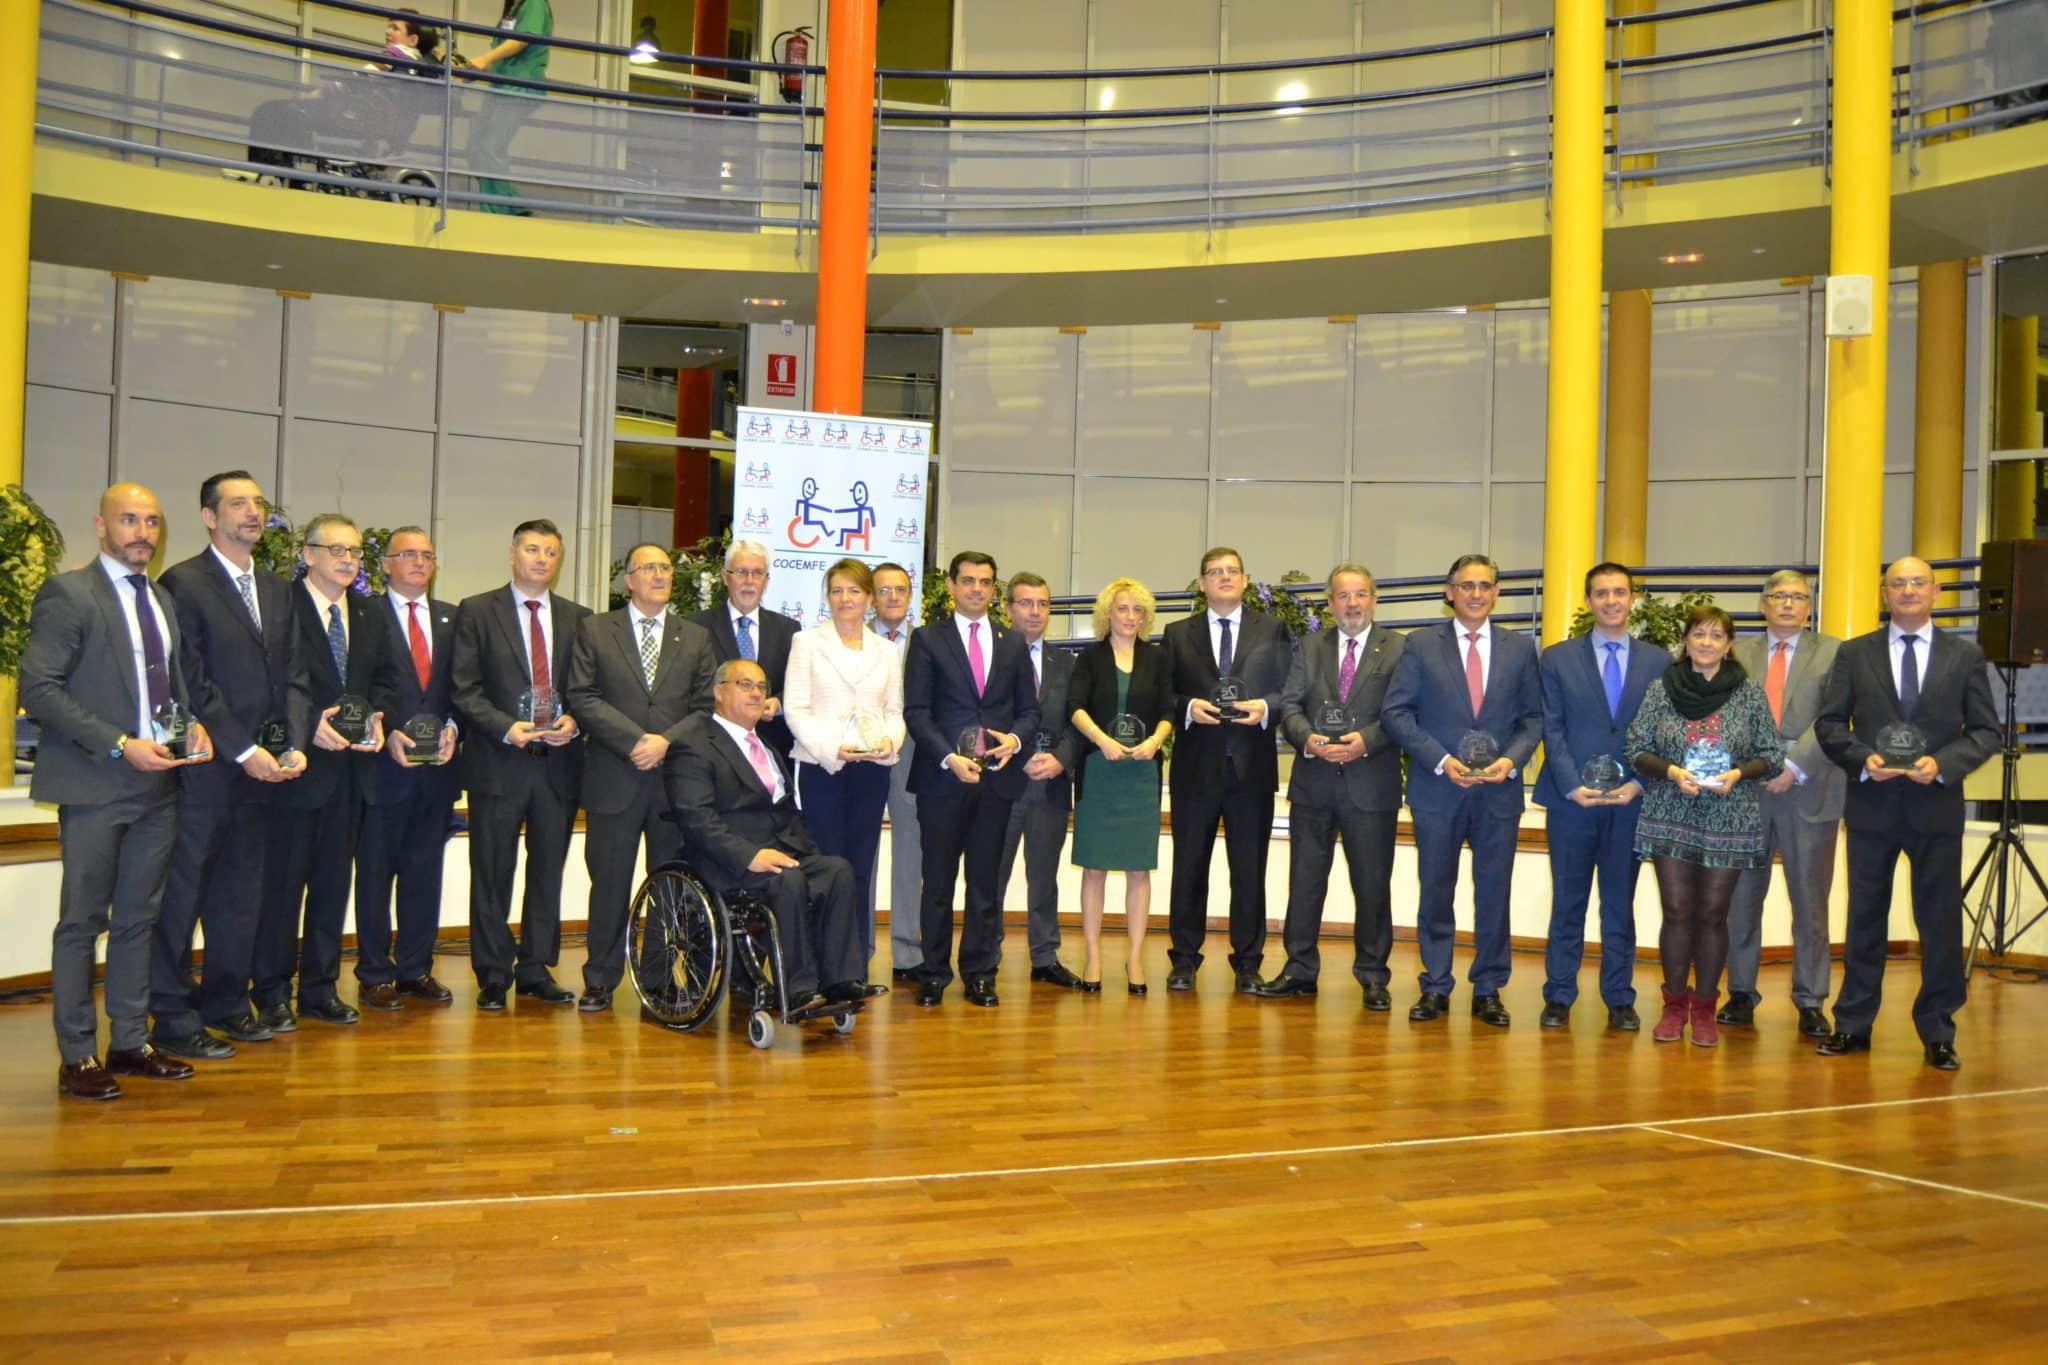 https://blog.globalcaja.es/wp-content/uploads/2015/12/Foto-familiar-25-Aniversario.jpg